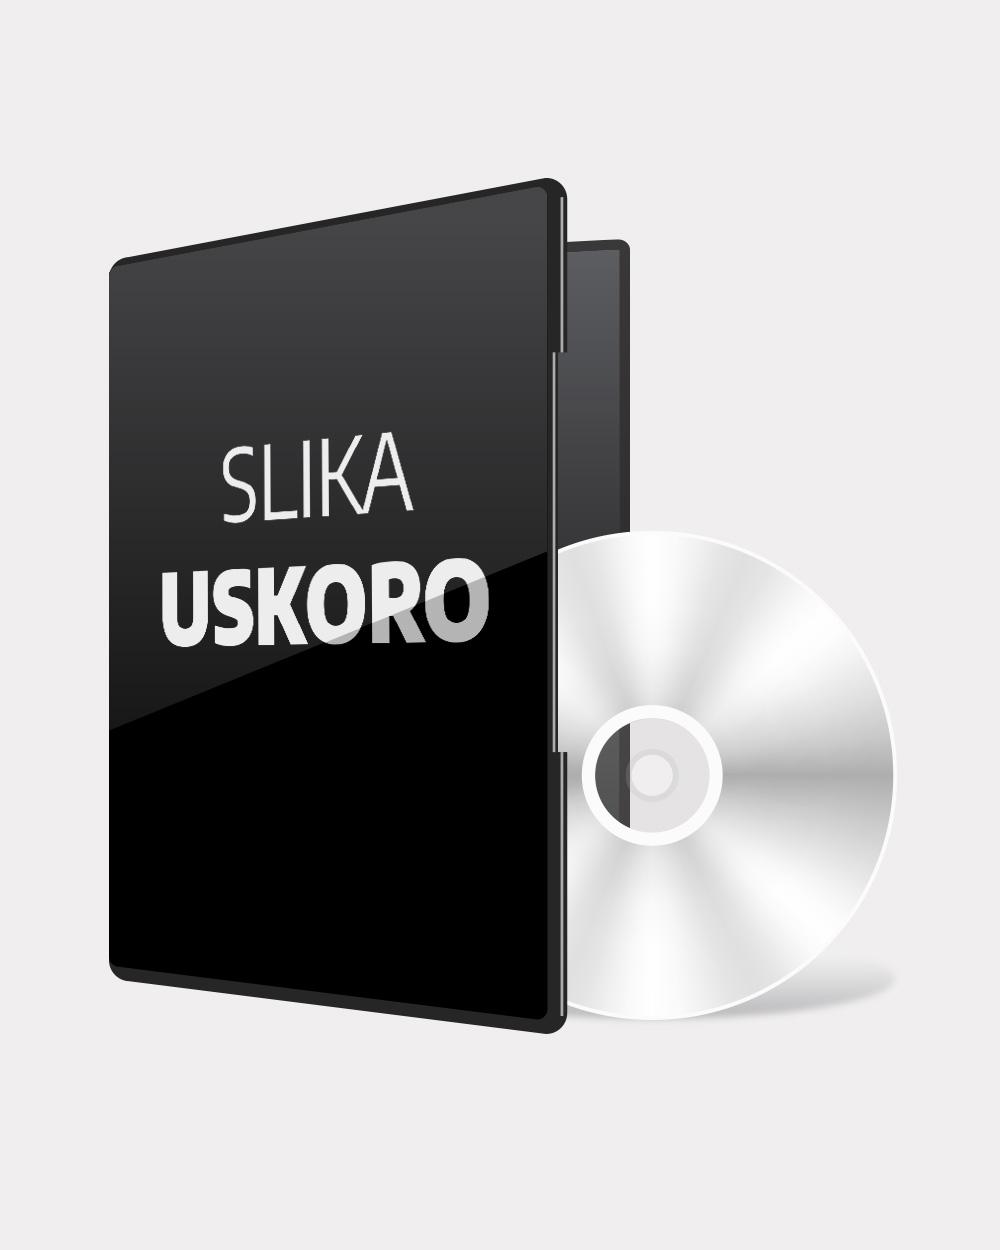 PS4 Evolve